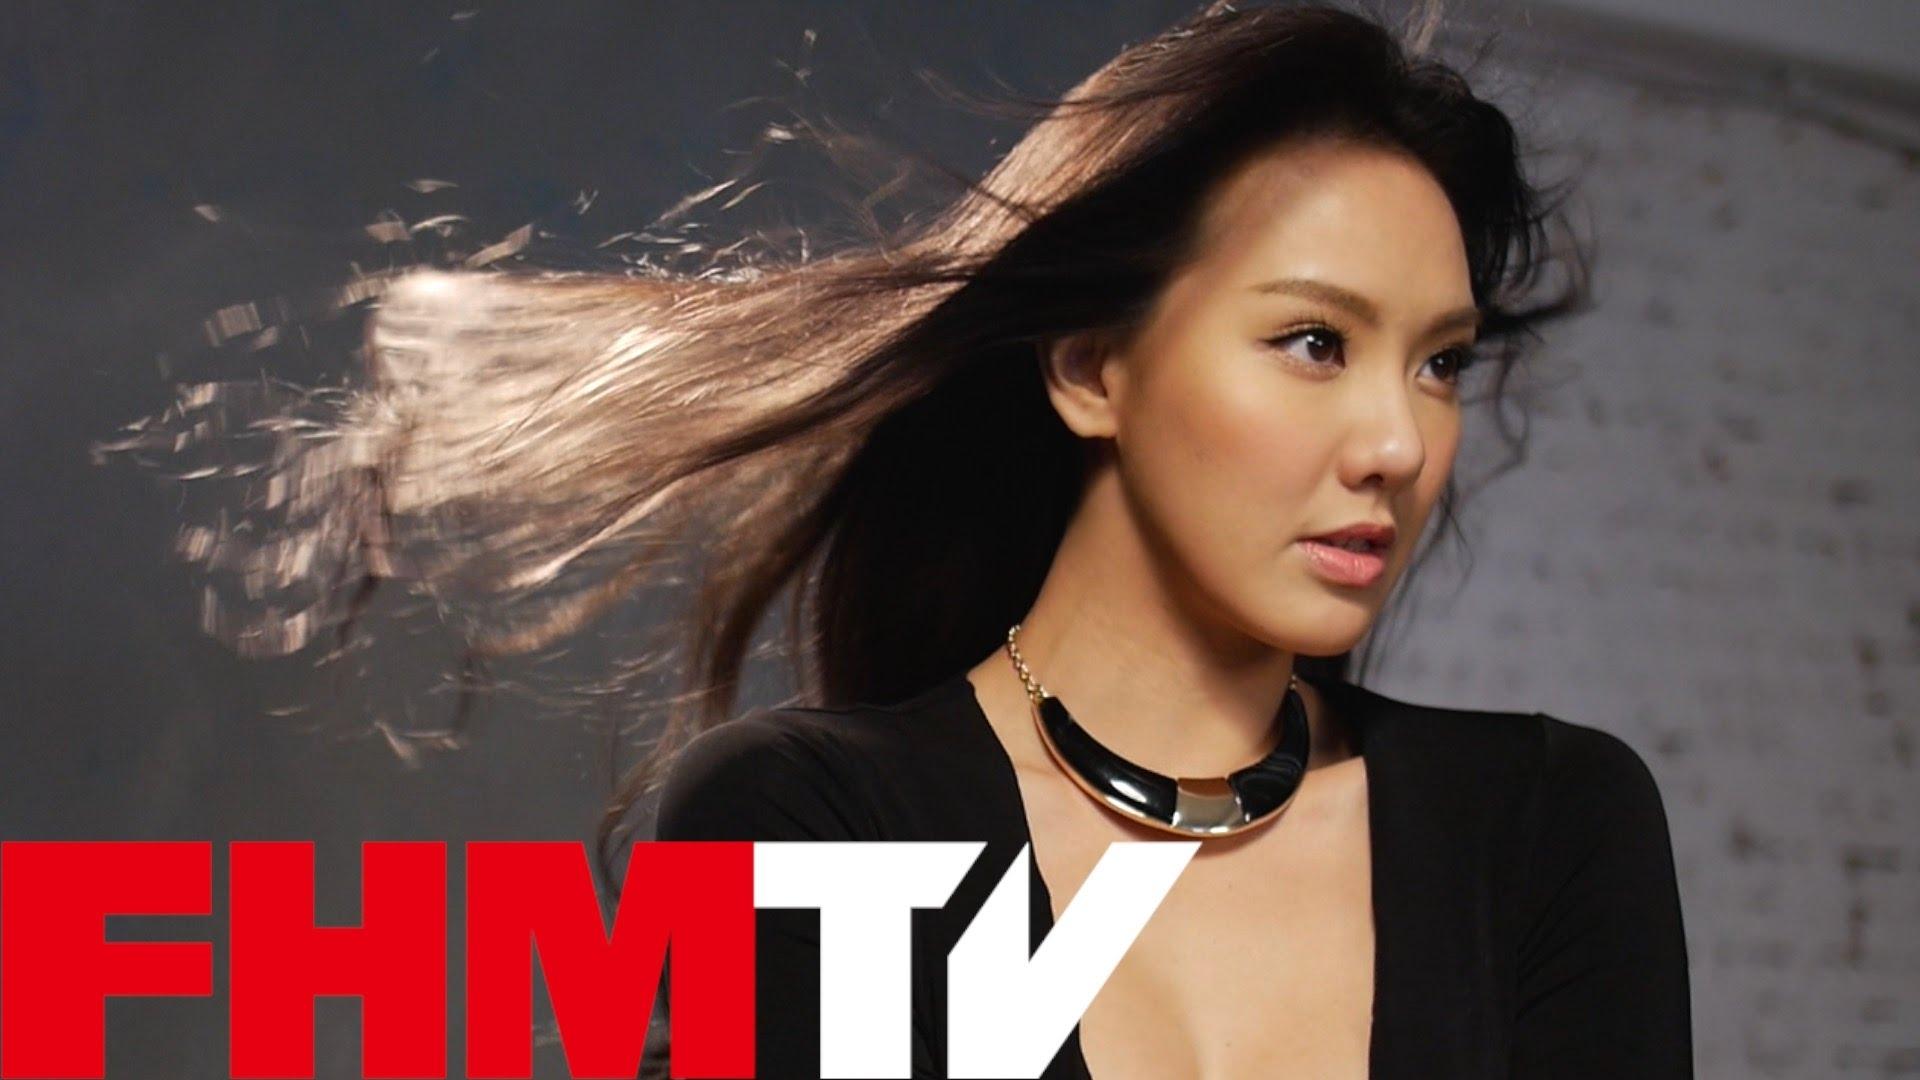 FHM Cover Girl 性感地讓你水裡來,火裡去──劉雨柔!